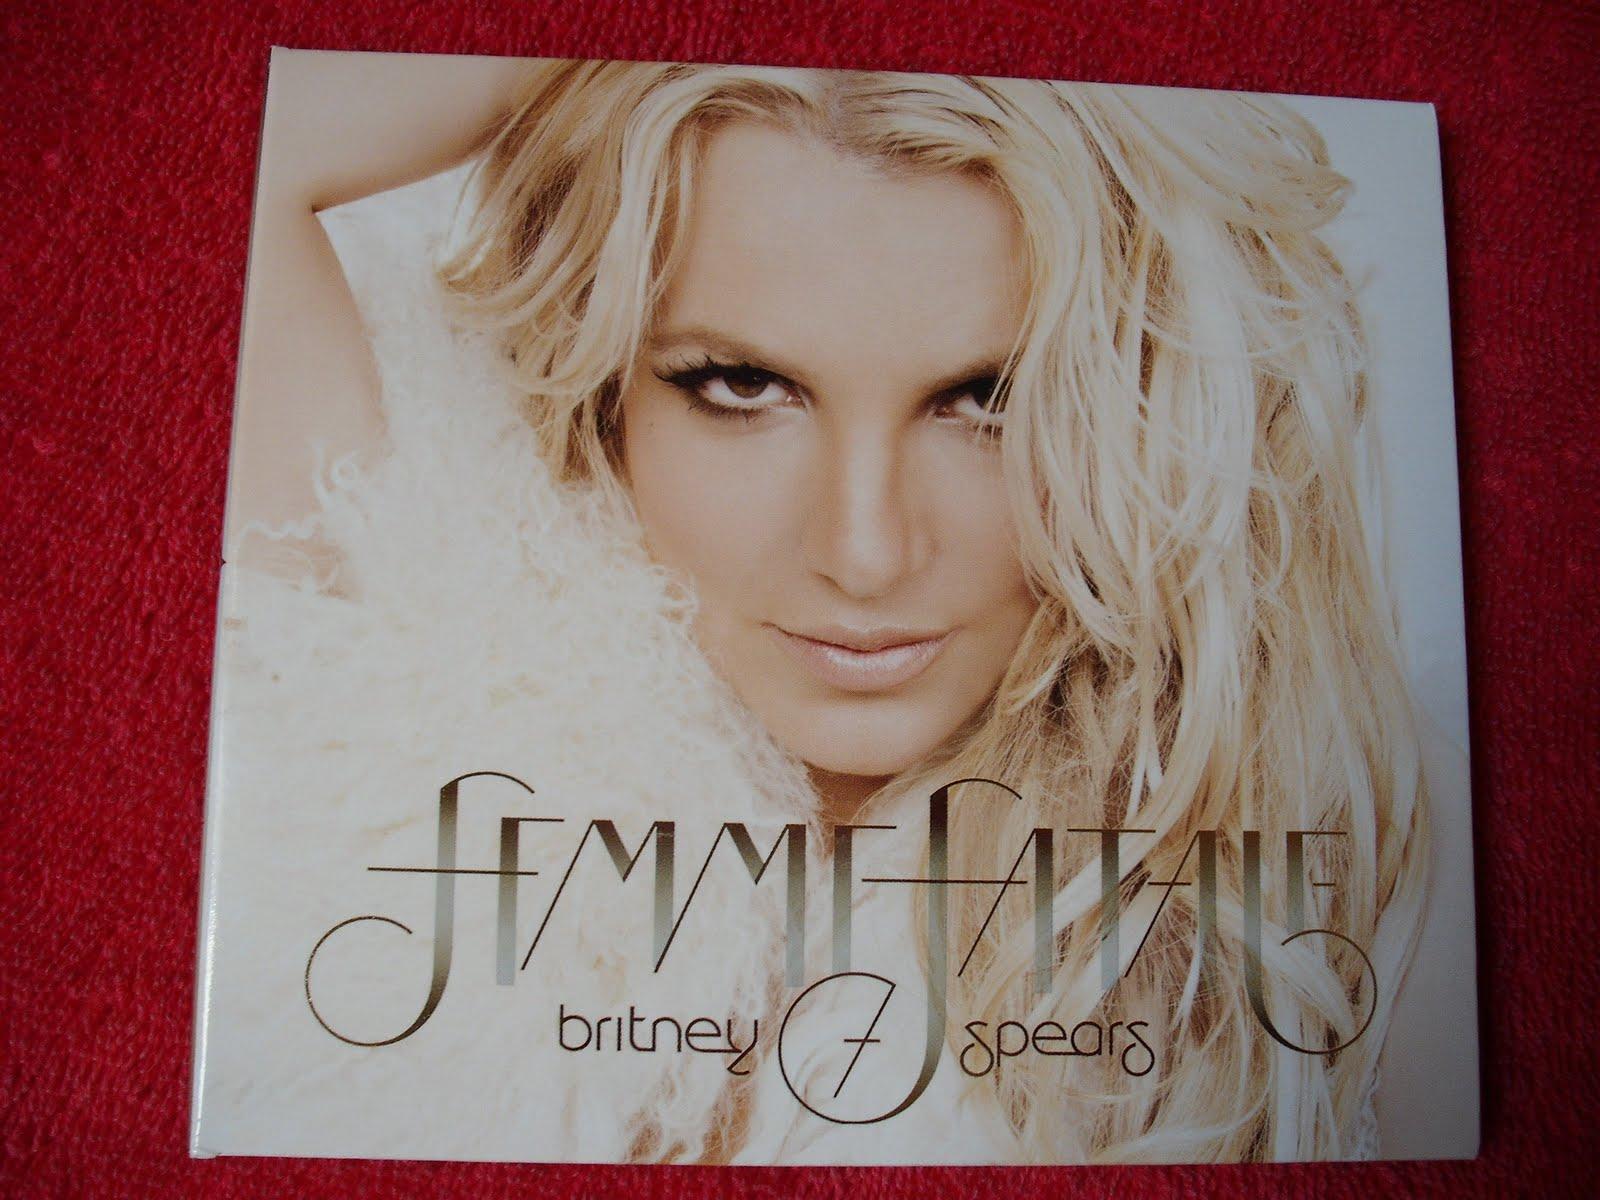 Britney Spears >> Tu colección de Britney Britney+Spears+Femme+Fatala+%25283%2529